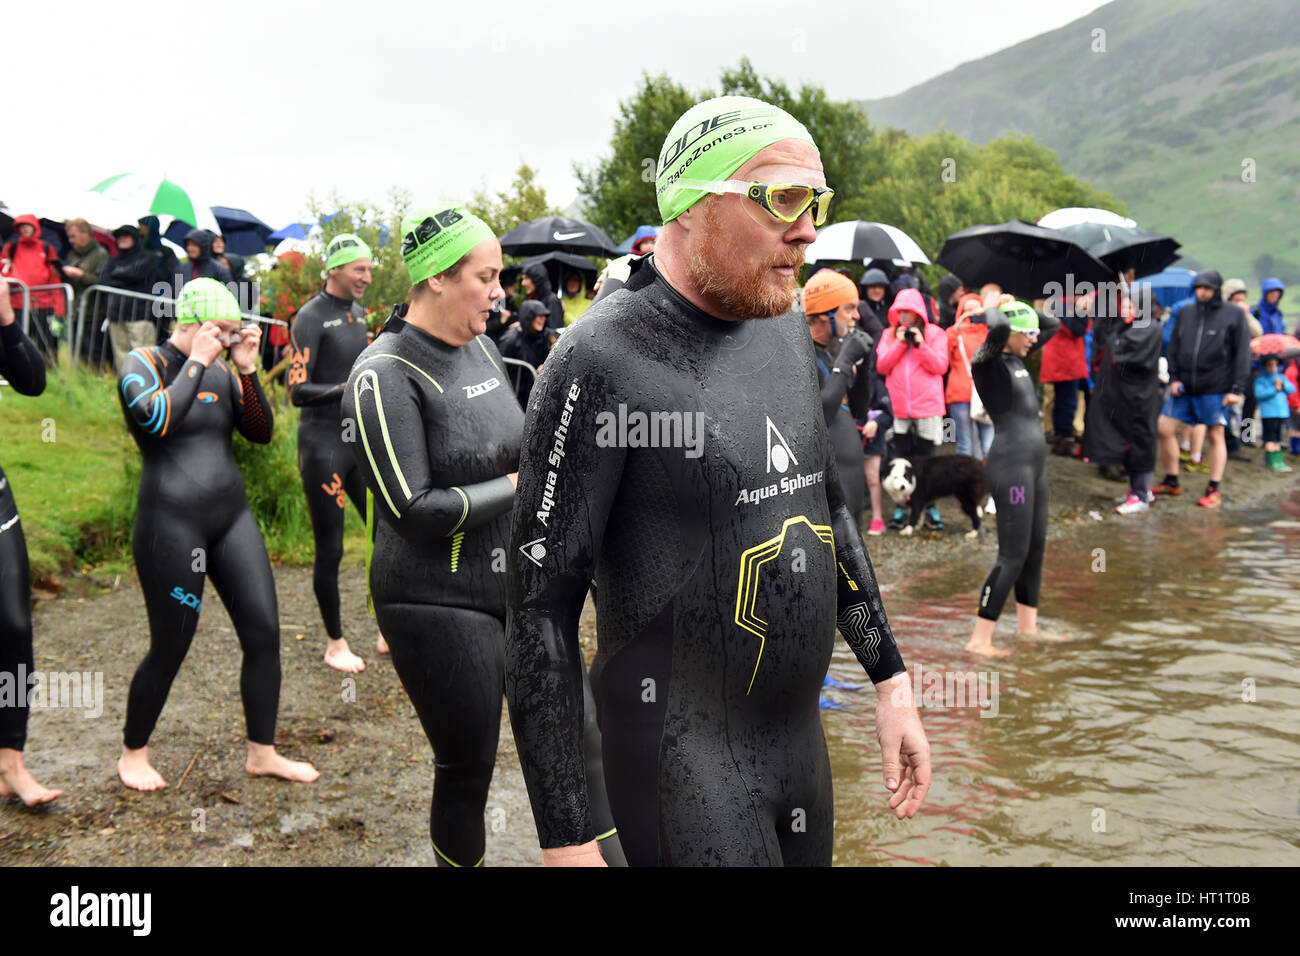 Open Water Swimming Event  Ullswater lake, Cumbria UK - Stock Image